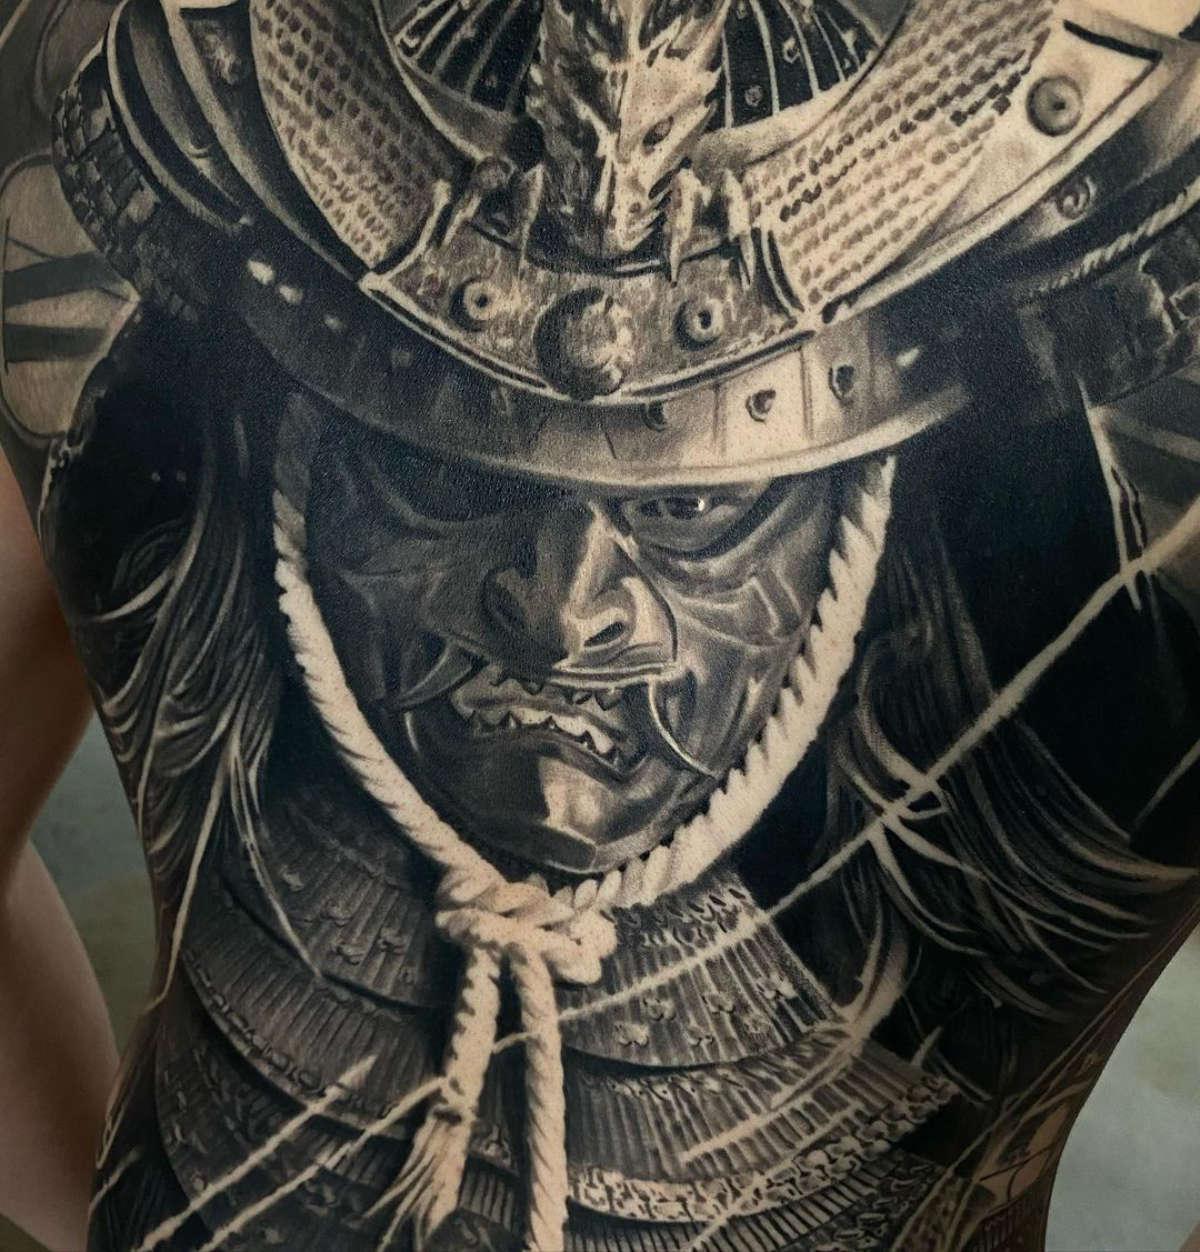 Samurai face detail